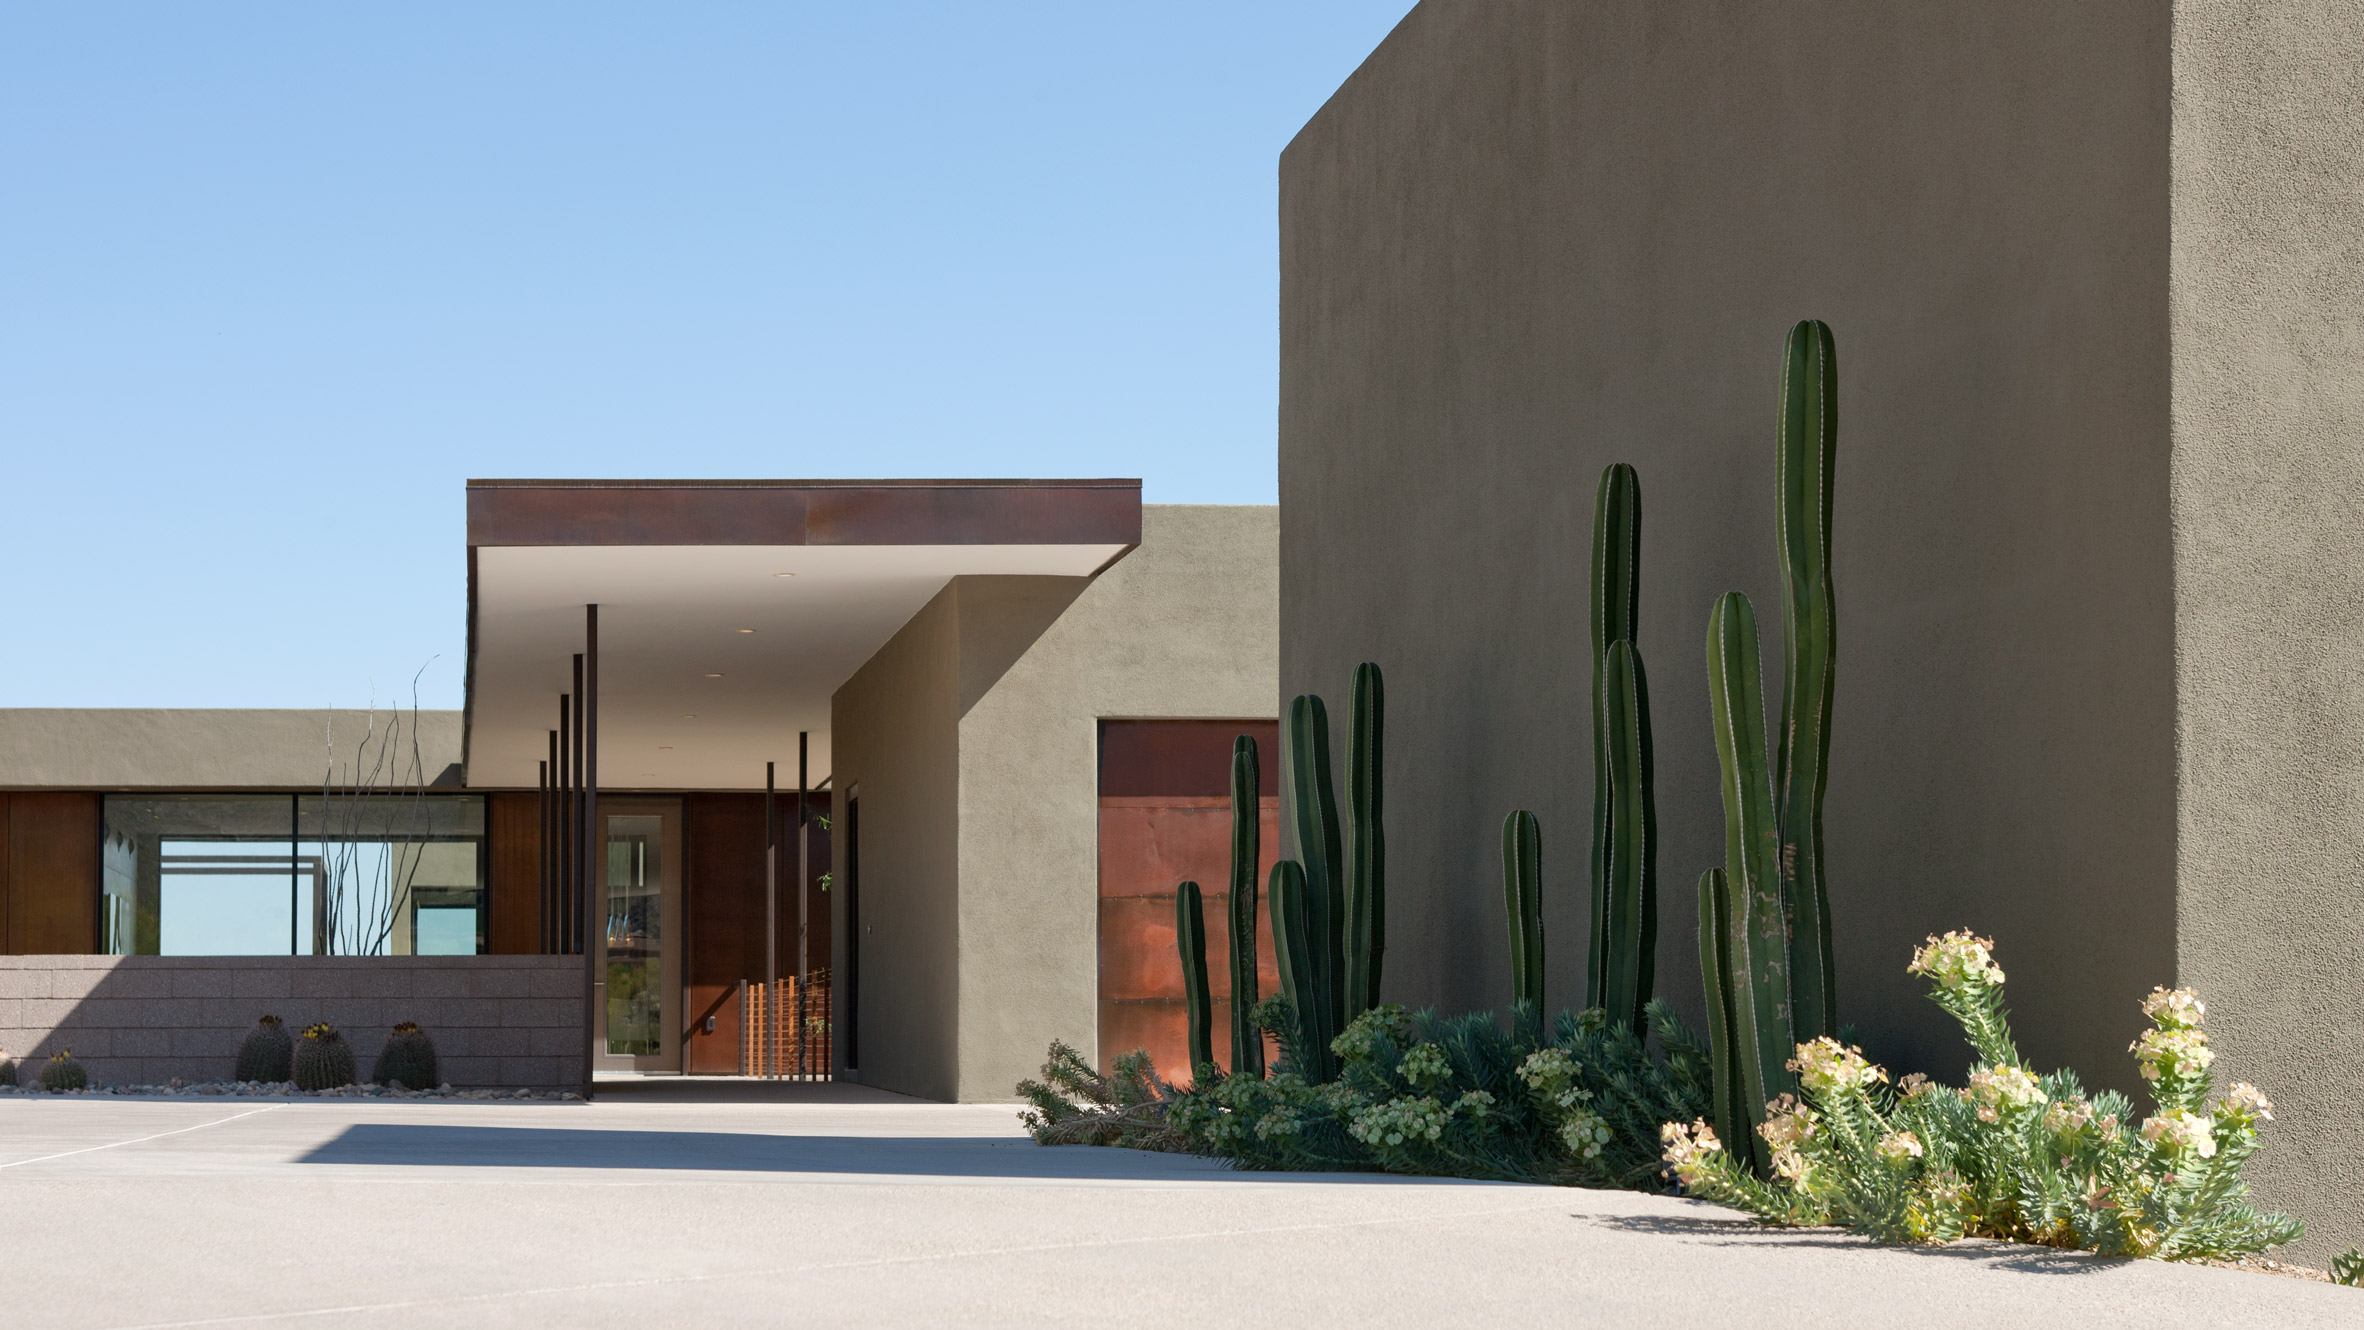 levin-residence-arizona-9.jpg